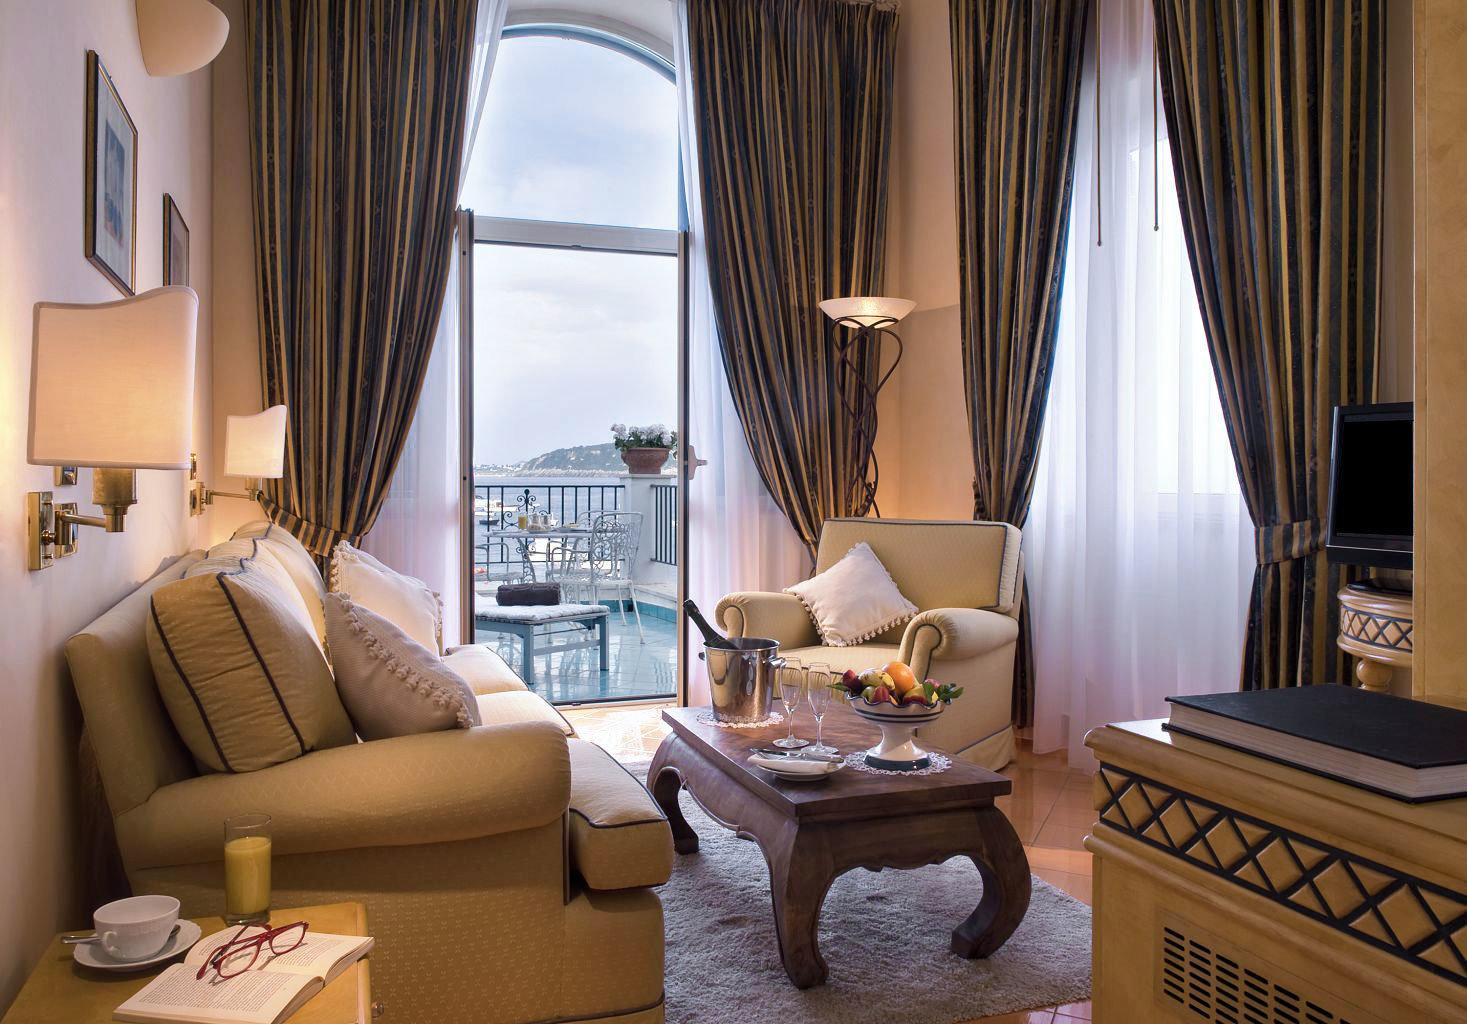 Elegant Luxury Suite sofa property curtain living room home cottage Bedroom